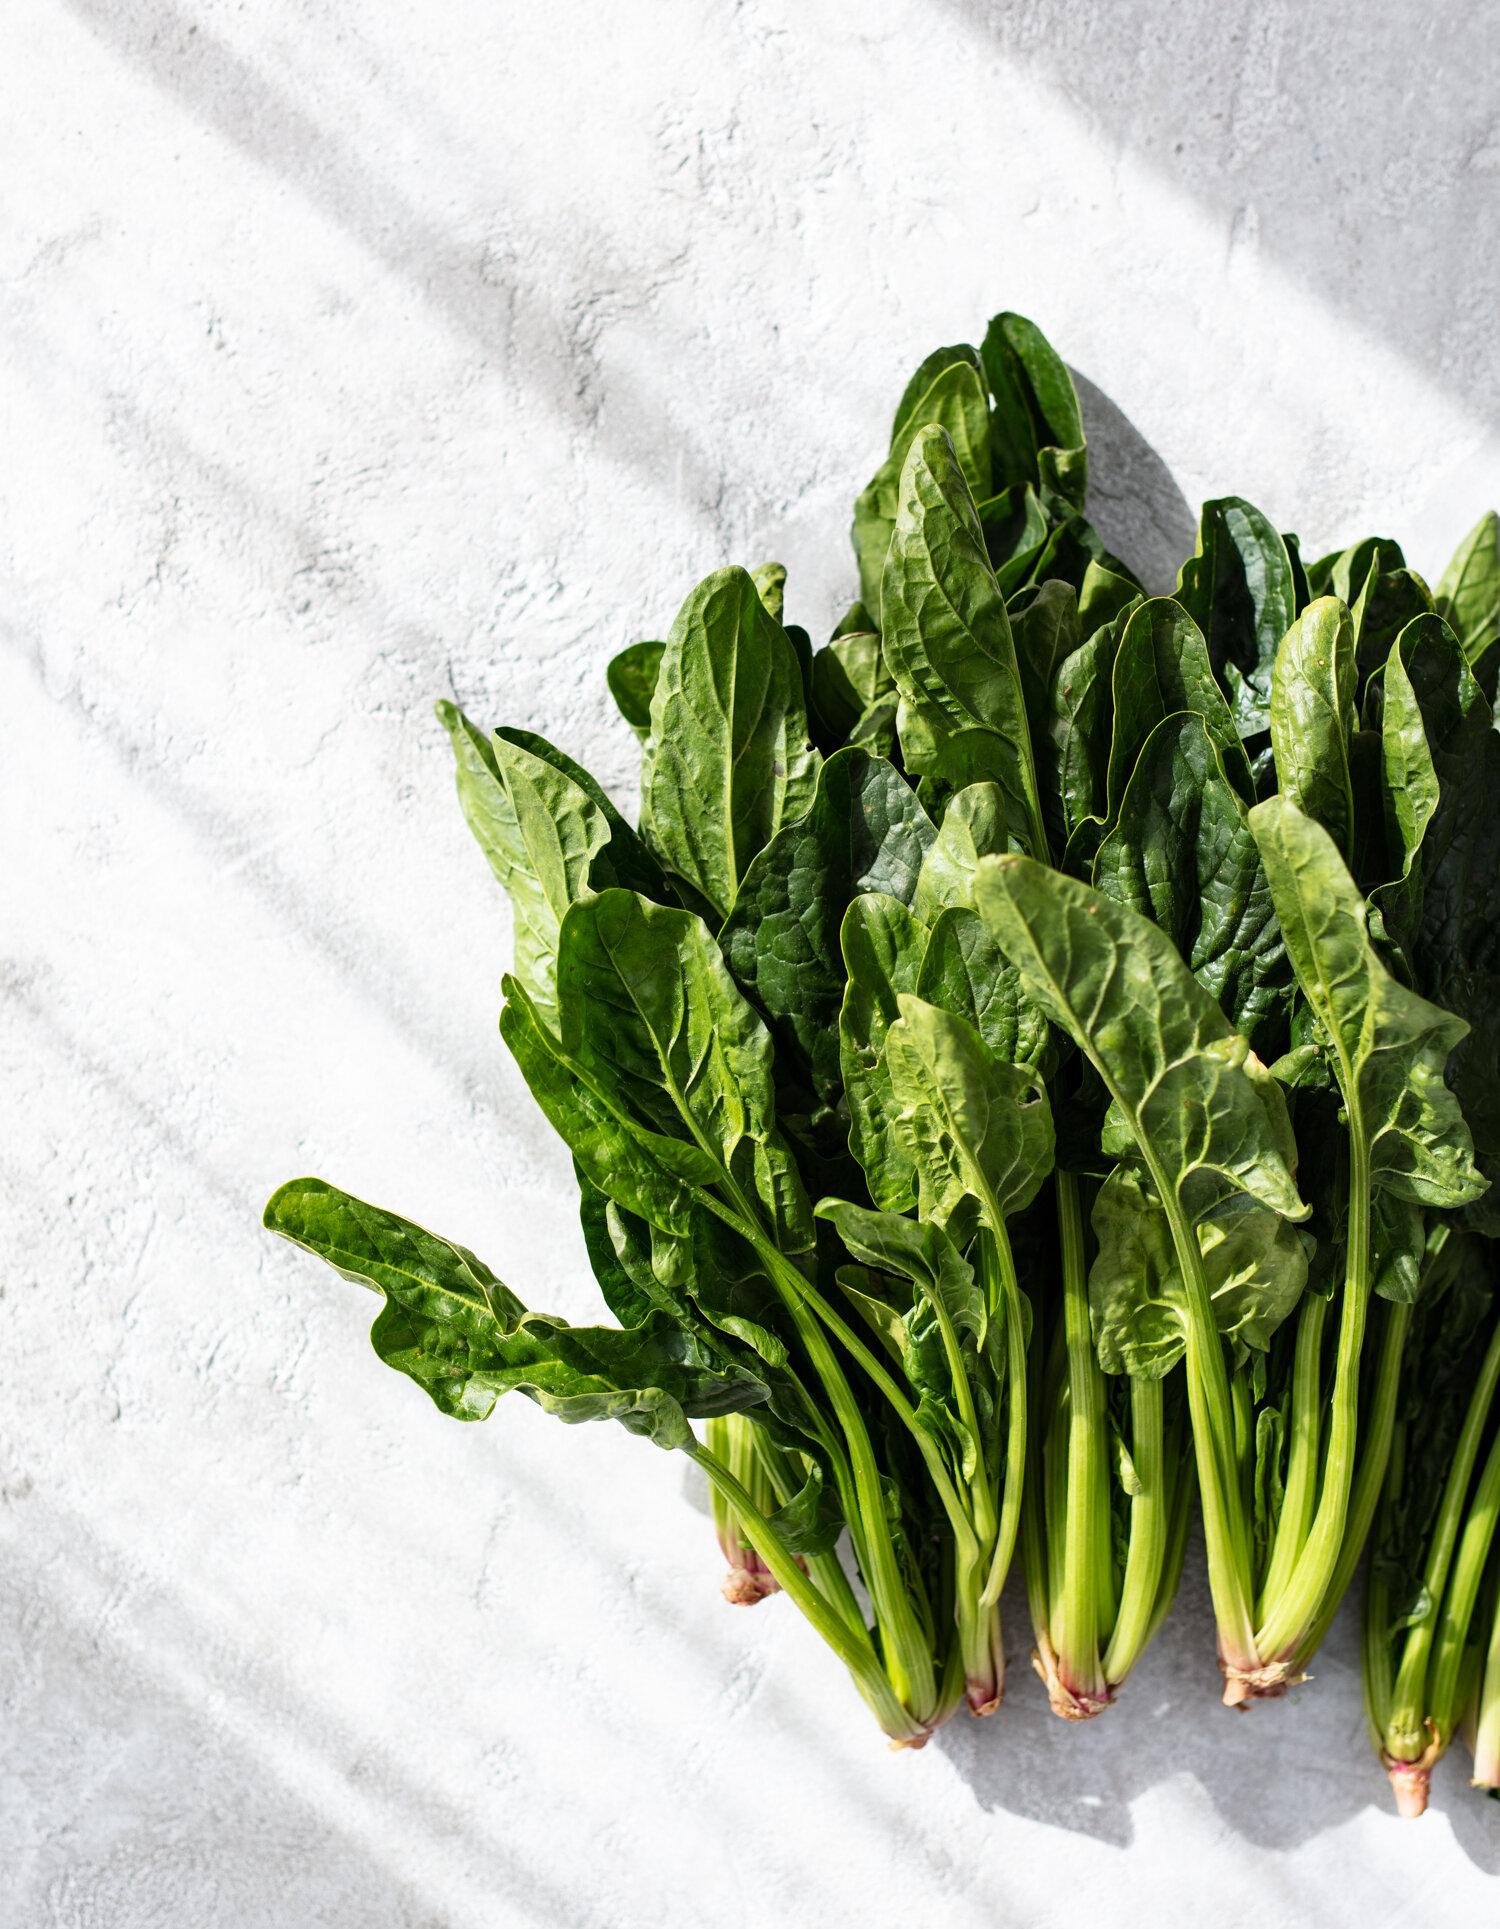 erin-scott-san-francisco-california-food-photographer-bryant-terry_williams-sonoma-catalog-spinach-0166.jpg